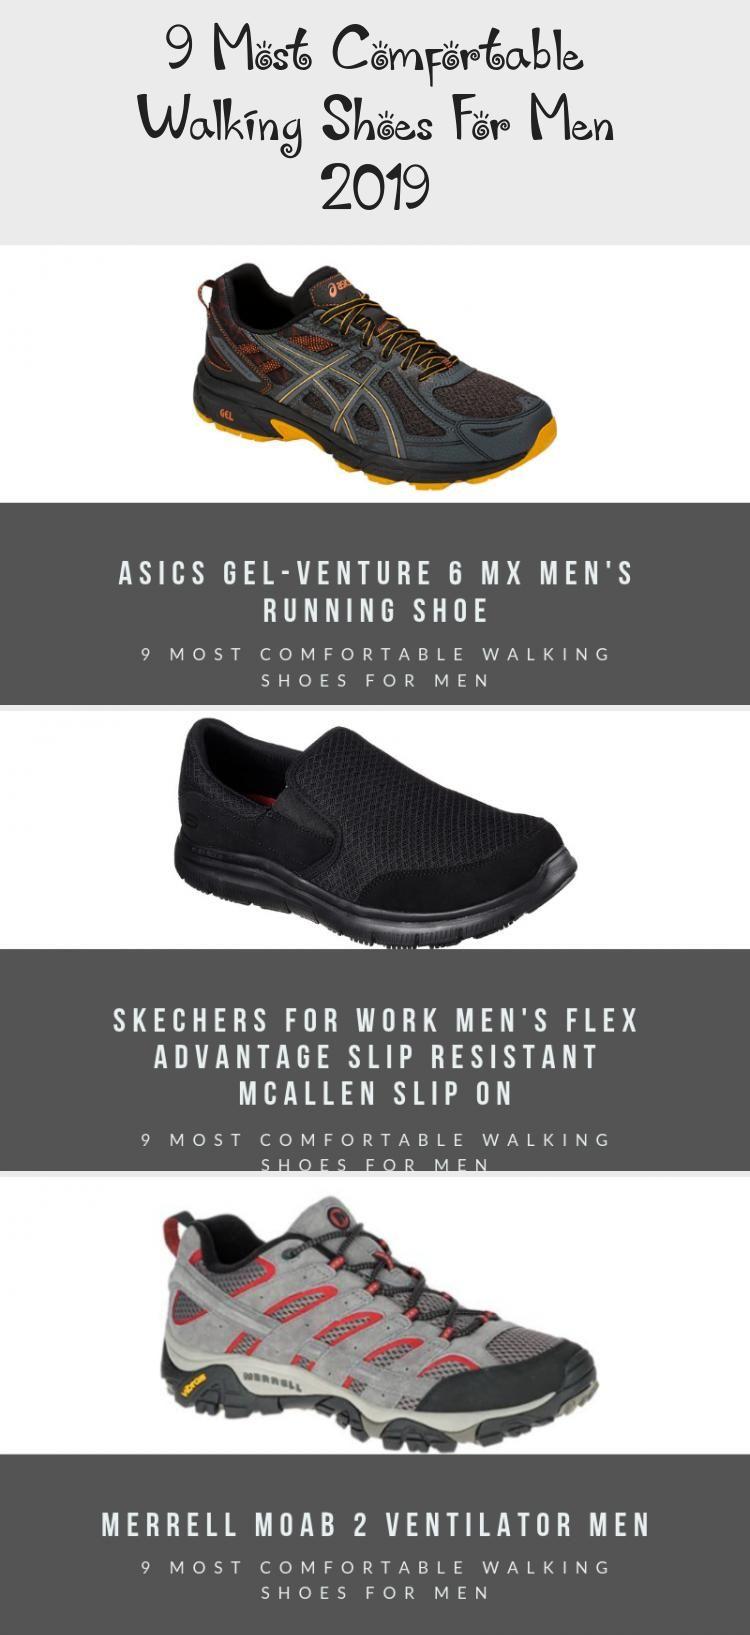 Walking Shoes For Men 2019 in 2020